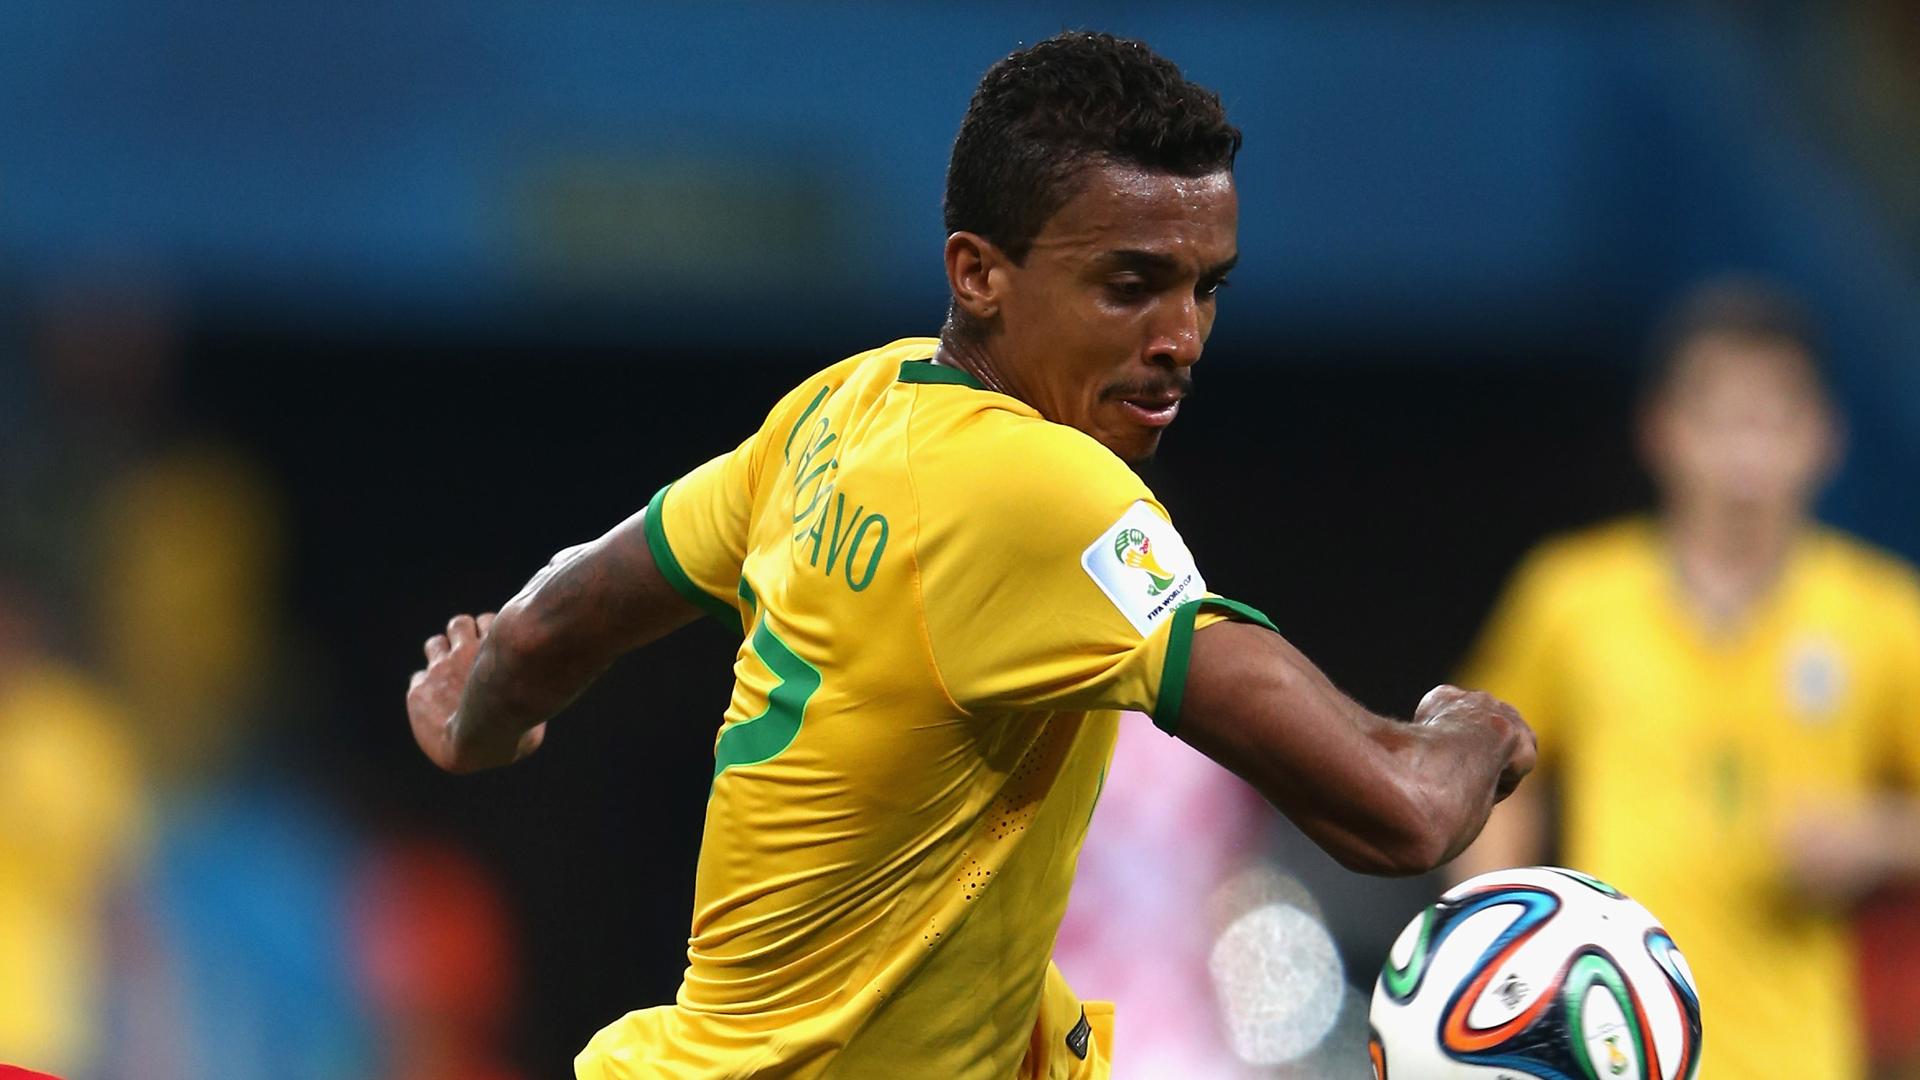 Neymar et les Parisiens retenus, pas Luiz Gustavo — Brésil